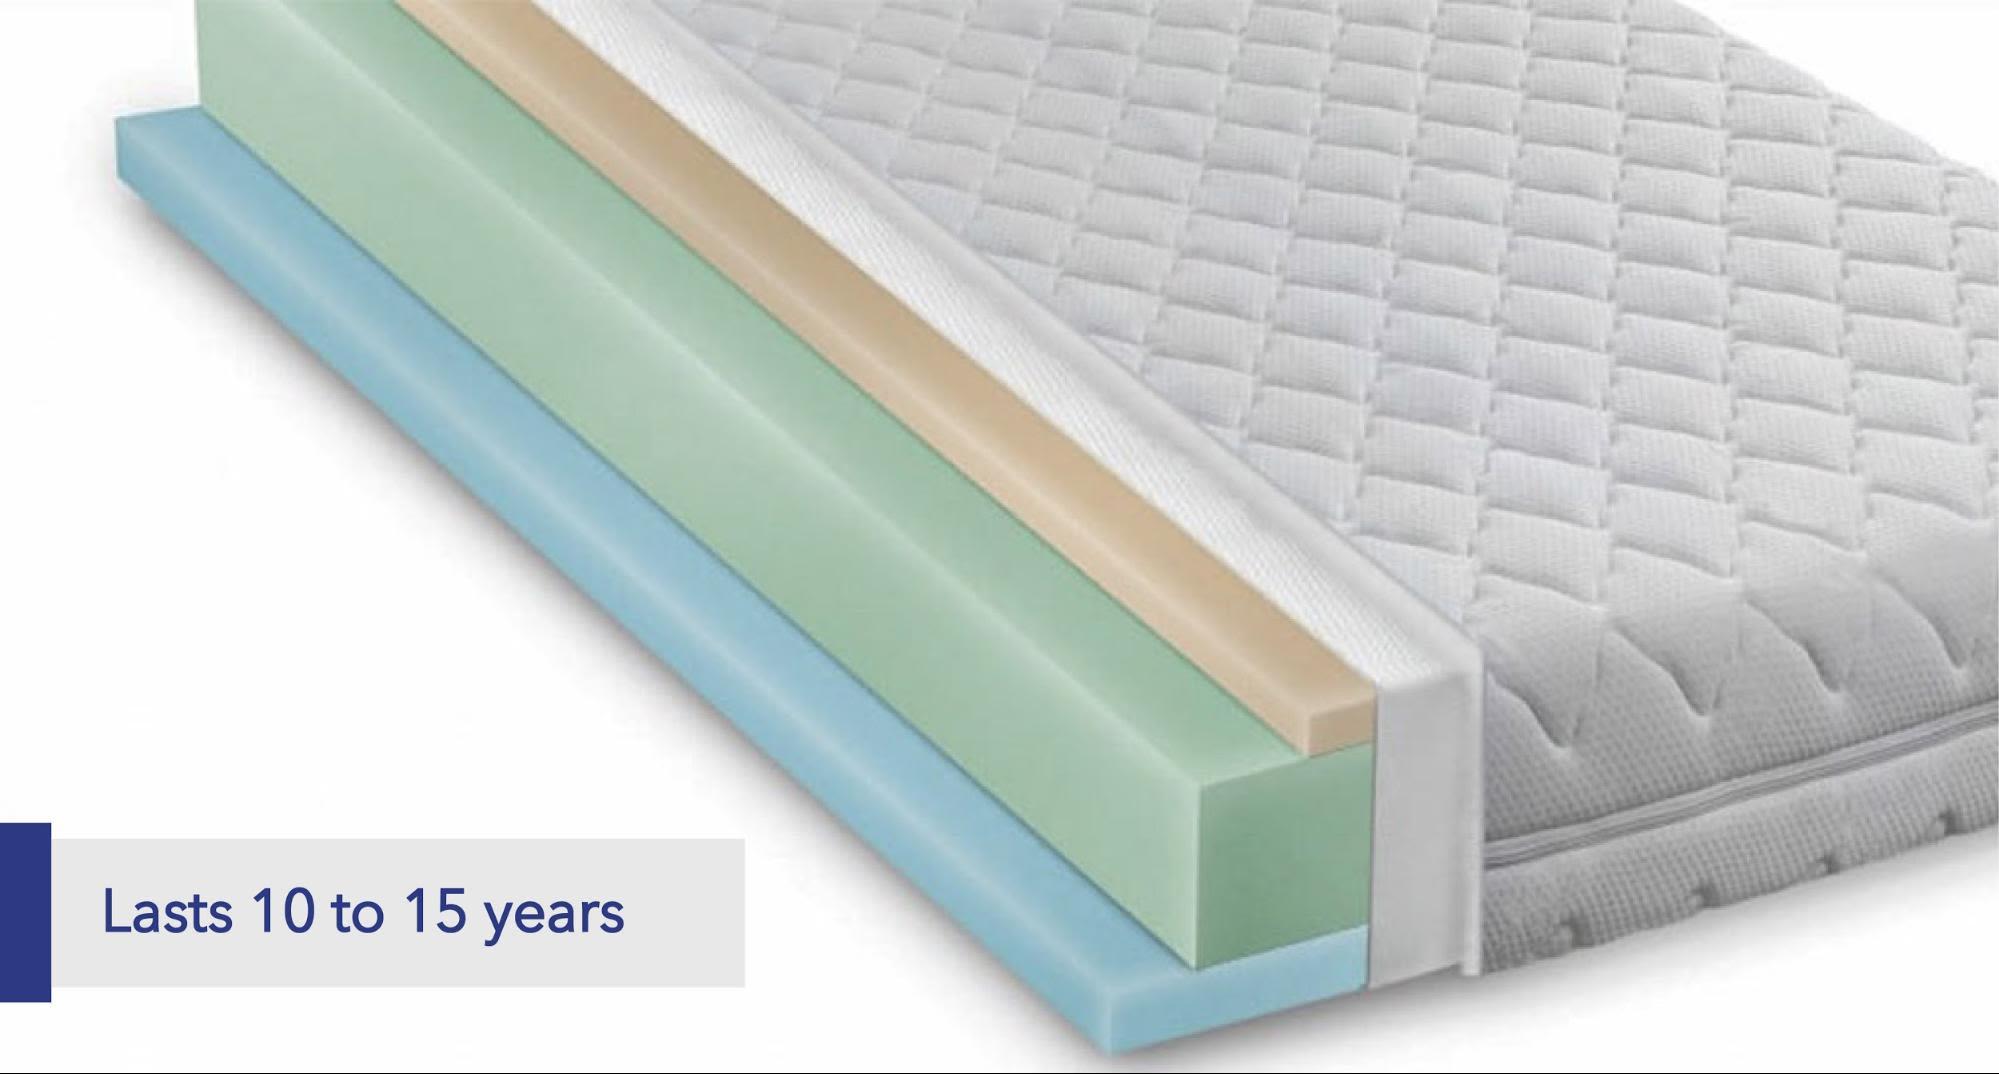 Gel foam lasts 10 to 15 years